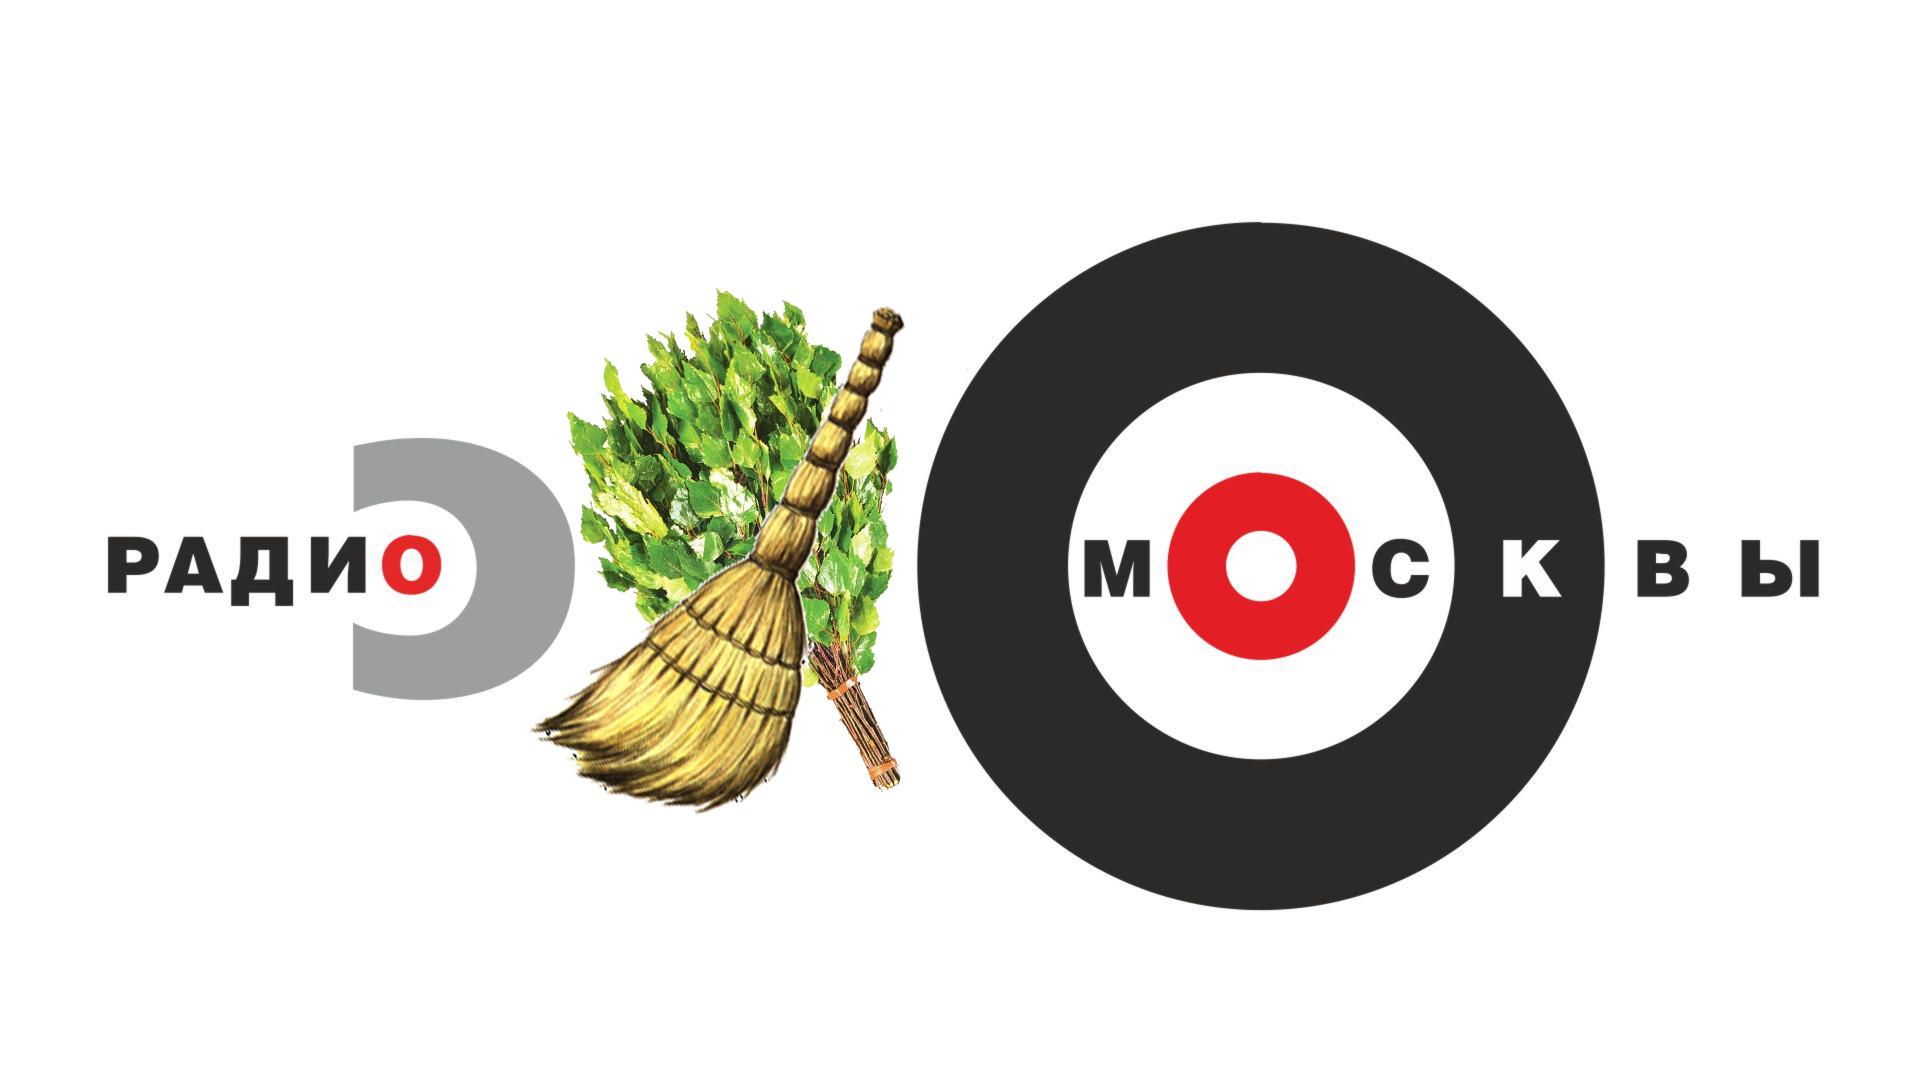 Дизайн логотипа р/с Эхо Москвы. фото f_34856210627e438e.jpg